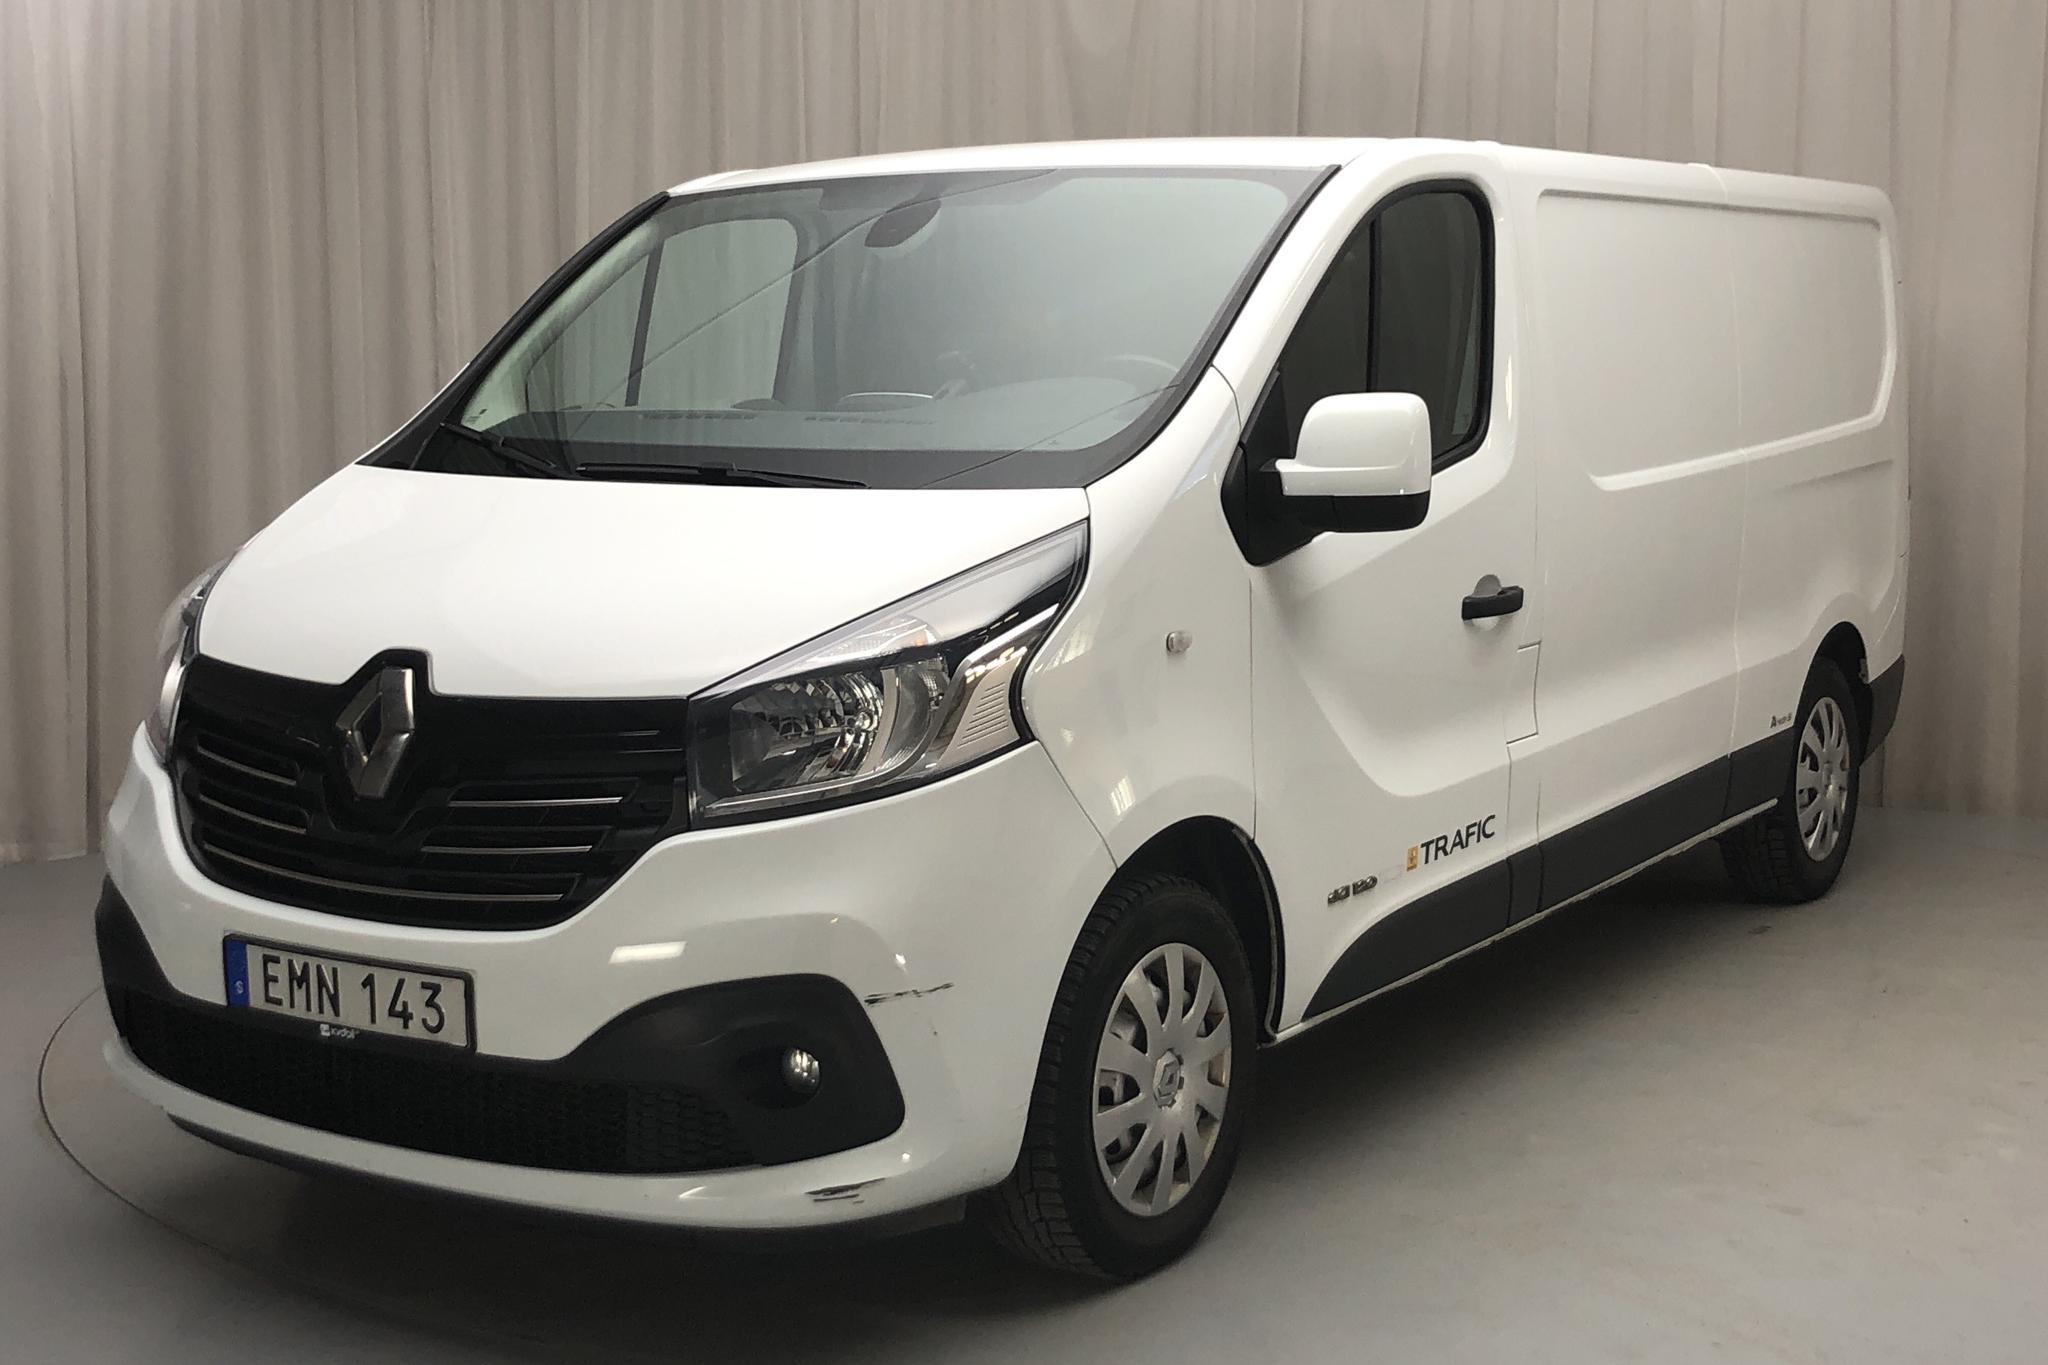 Renault Trafic 1.6 dCi Skåp (120hk) - 55 850 km - Manual - white - 2015